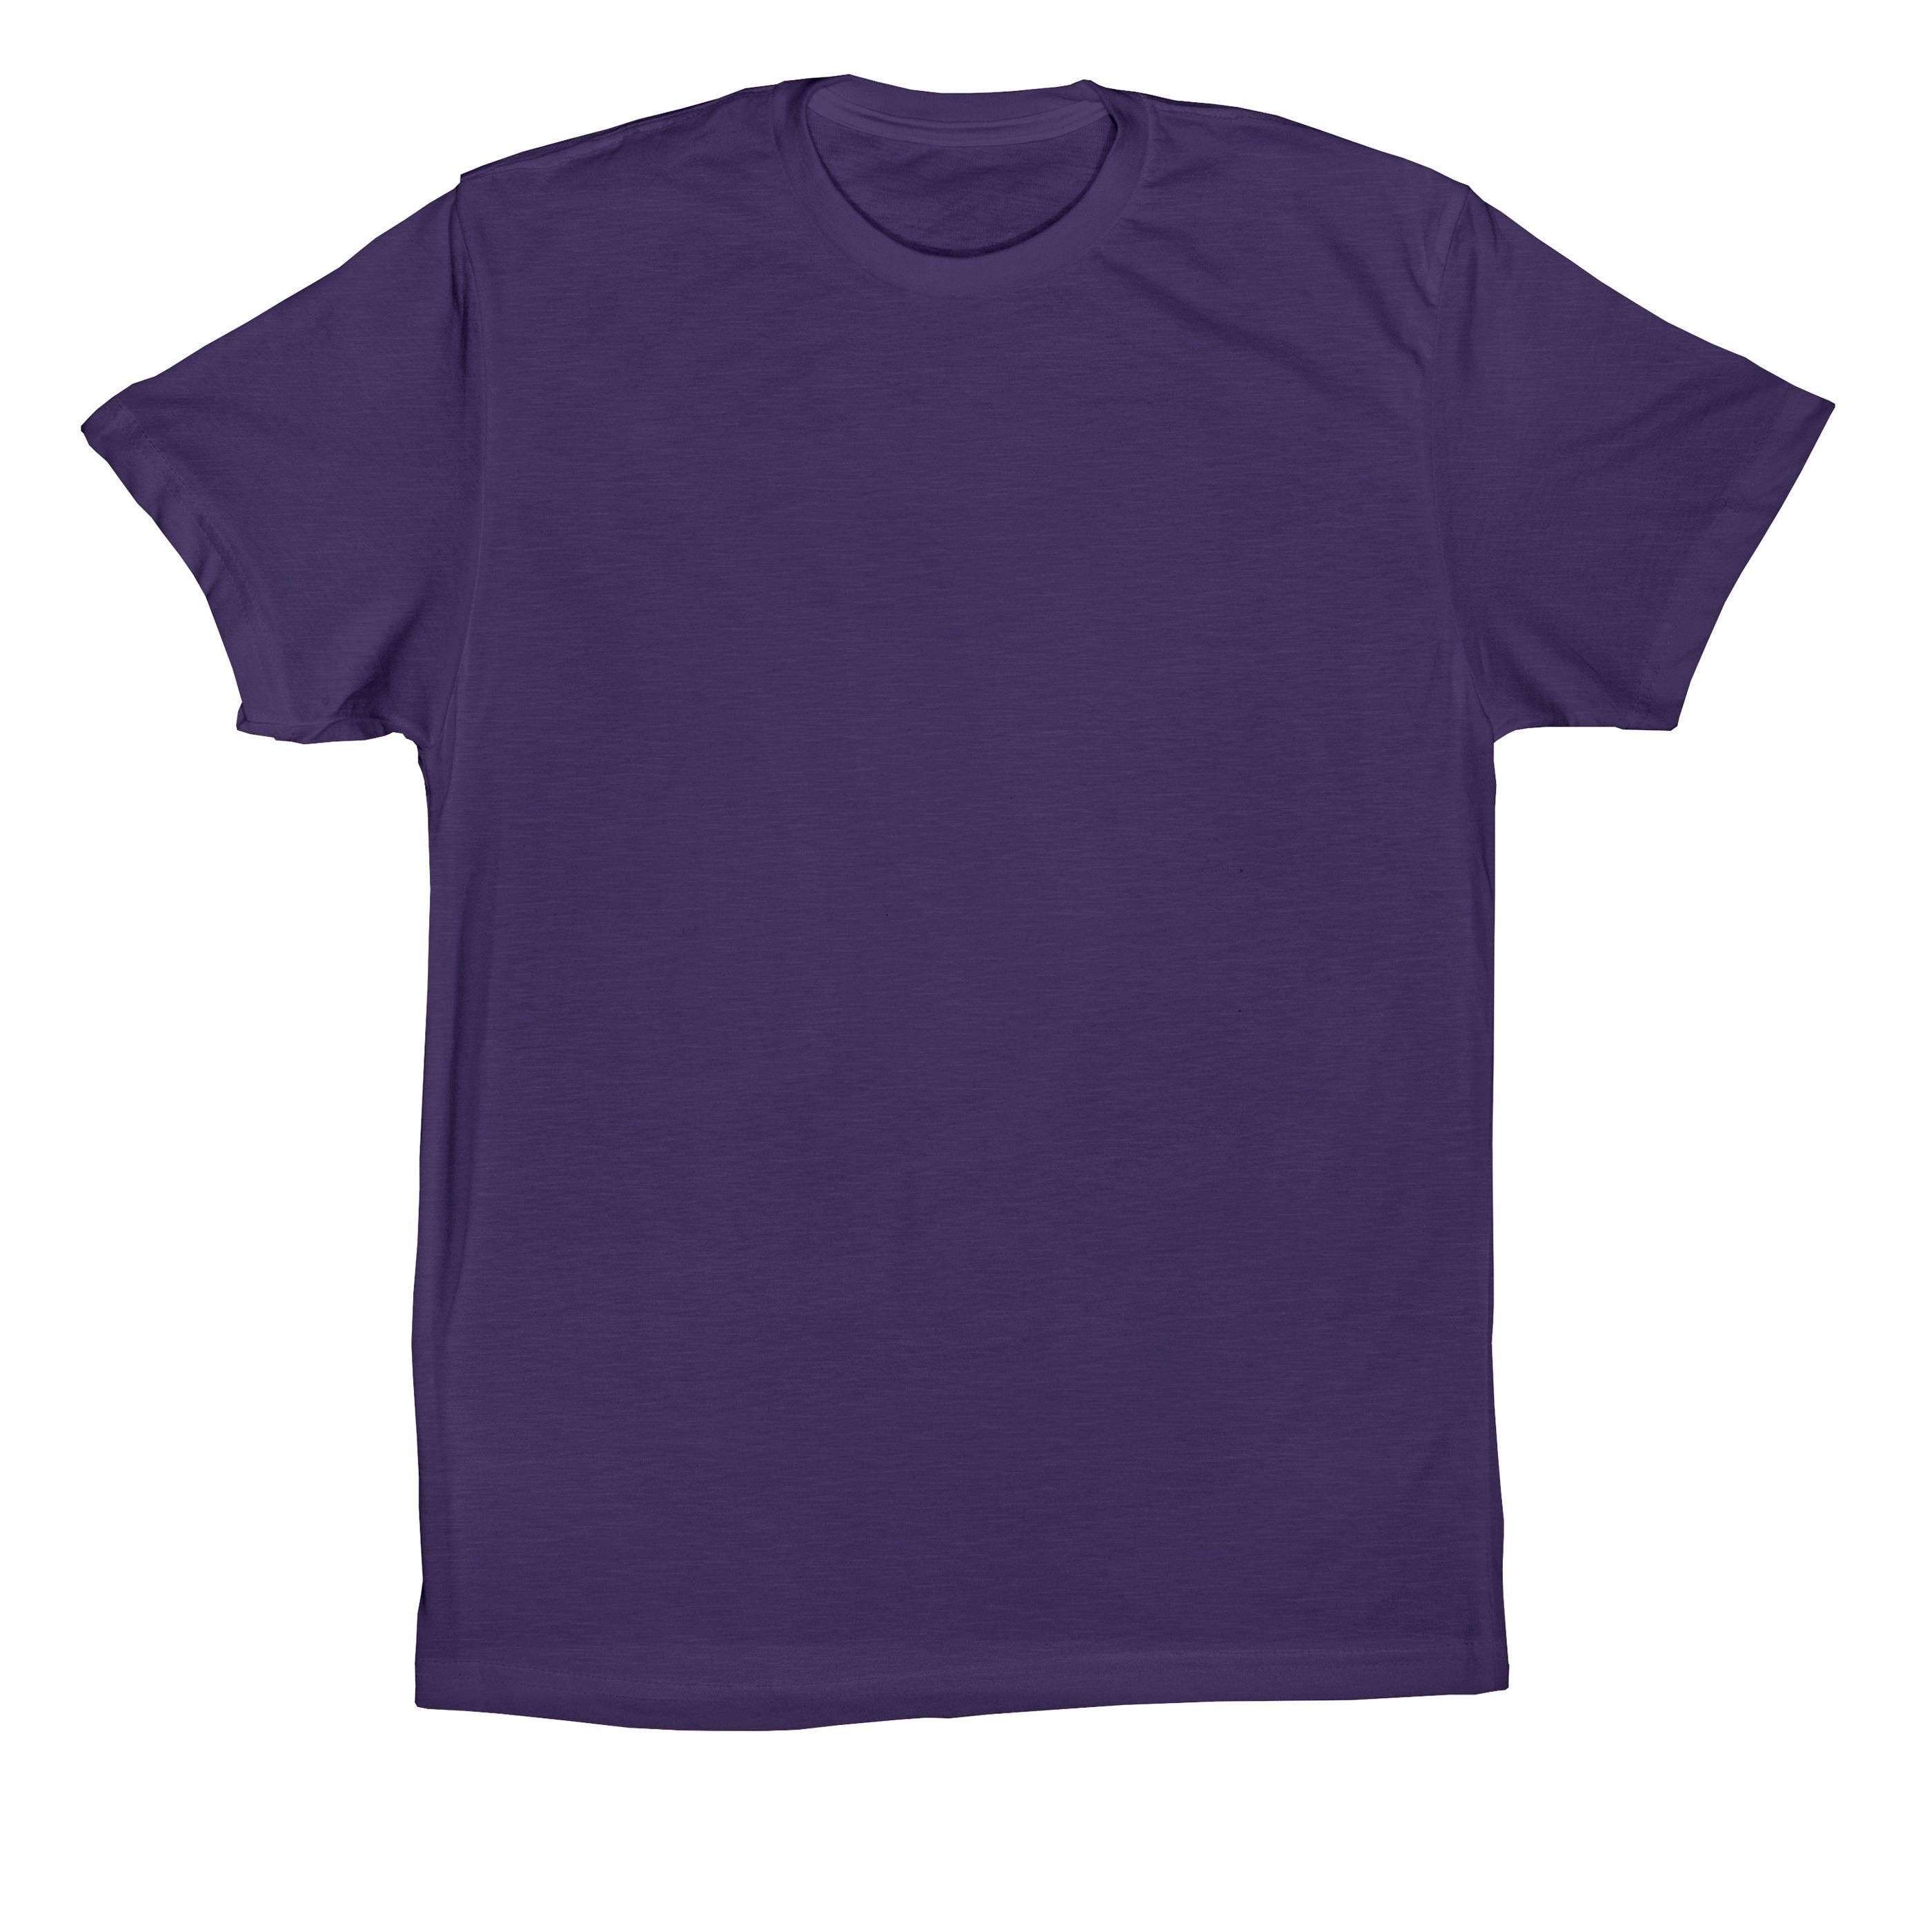 Design Tool Bonfire Fundraiser Ideas Design Custom Shirts